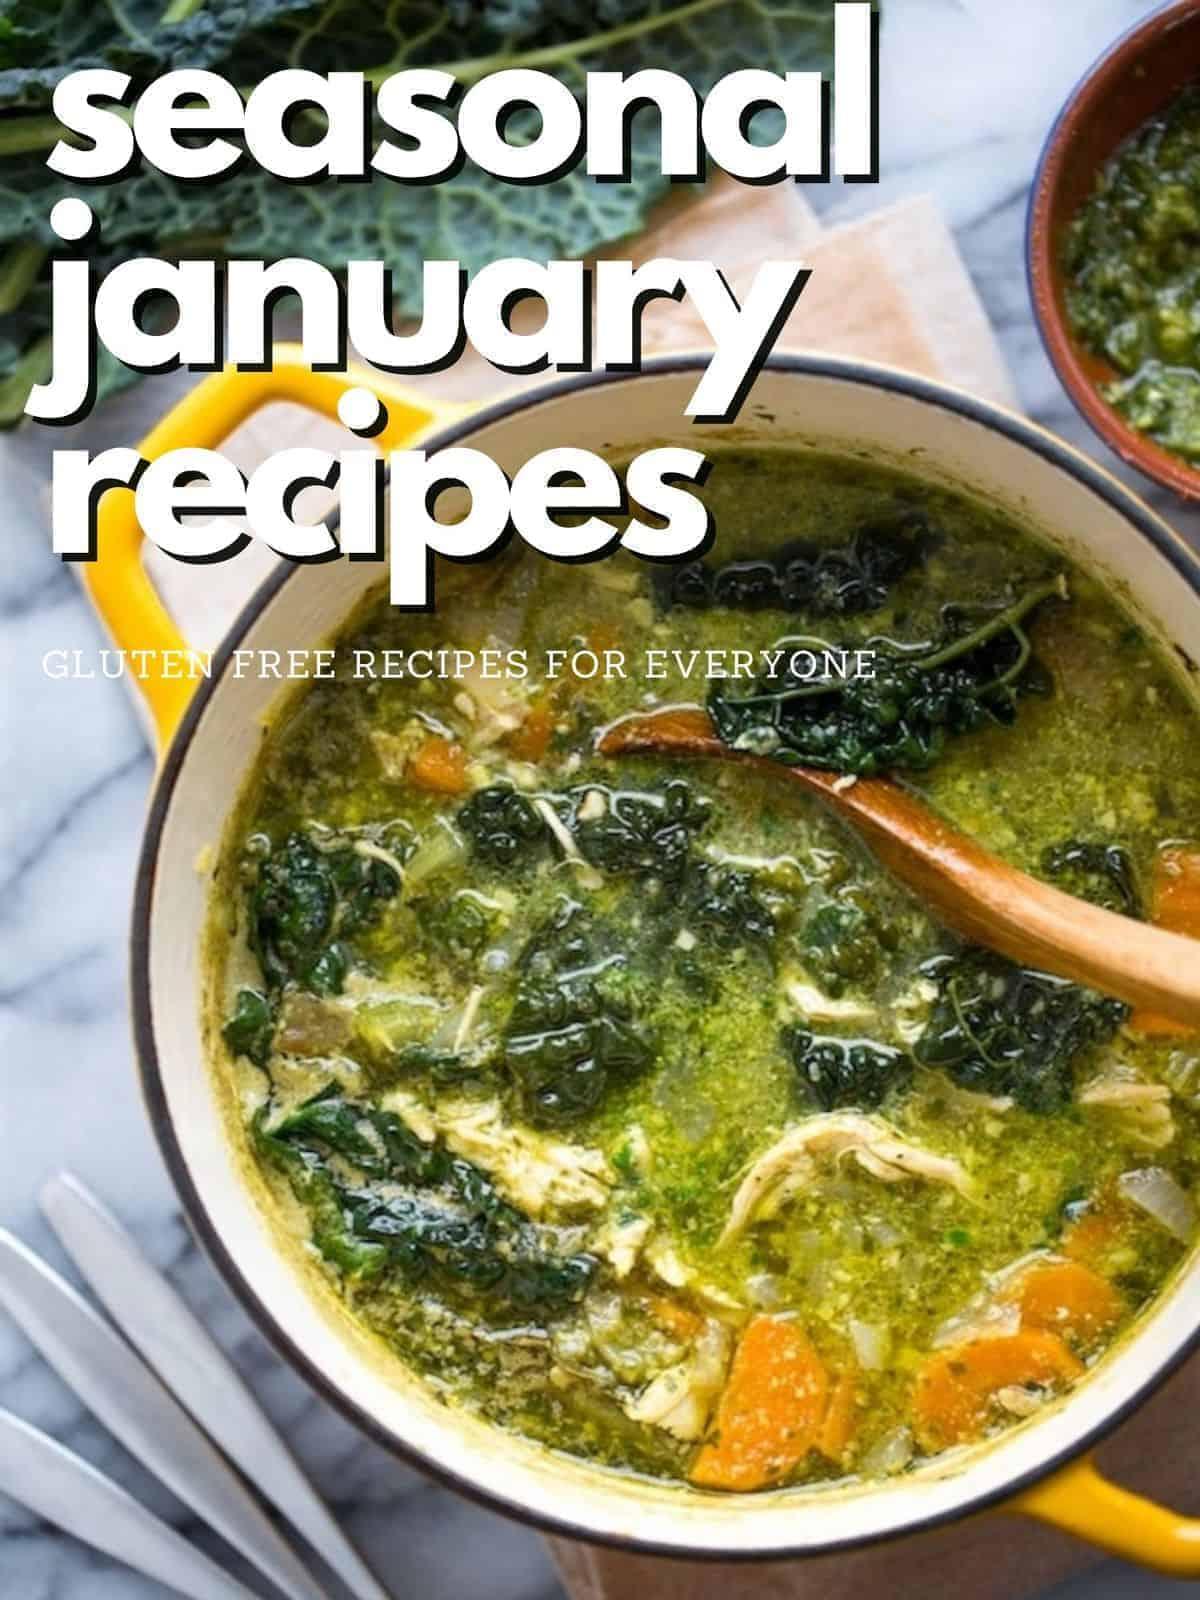 Eat Healthy & Seasonal In January